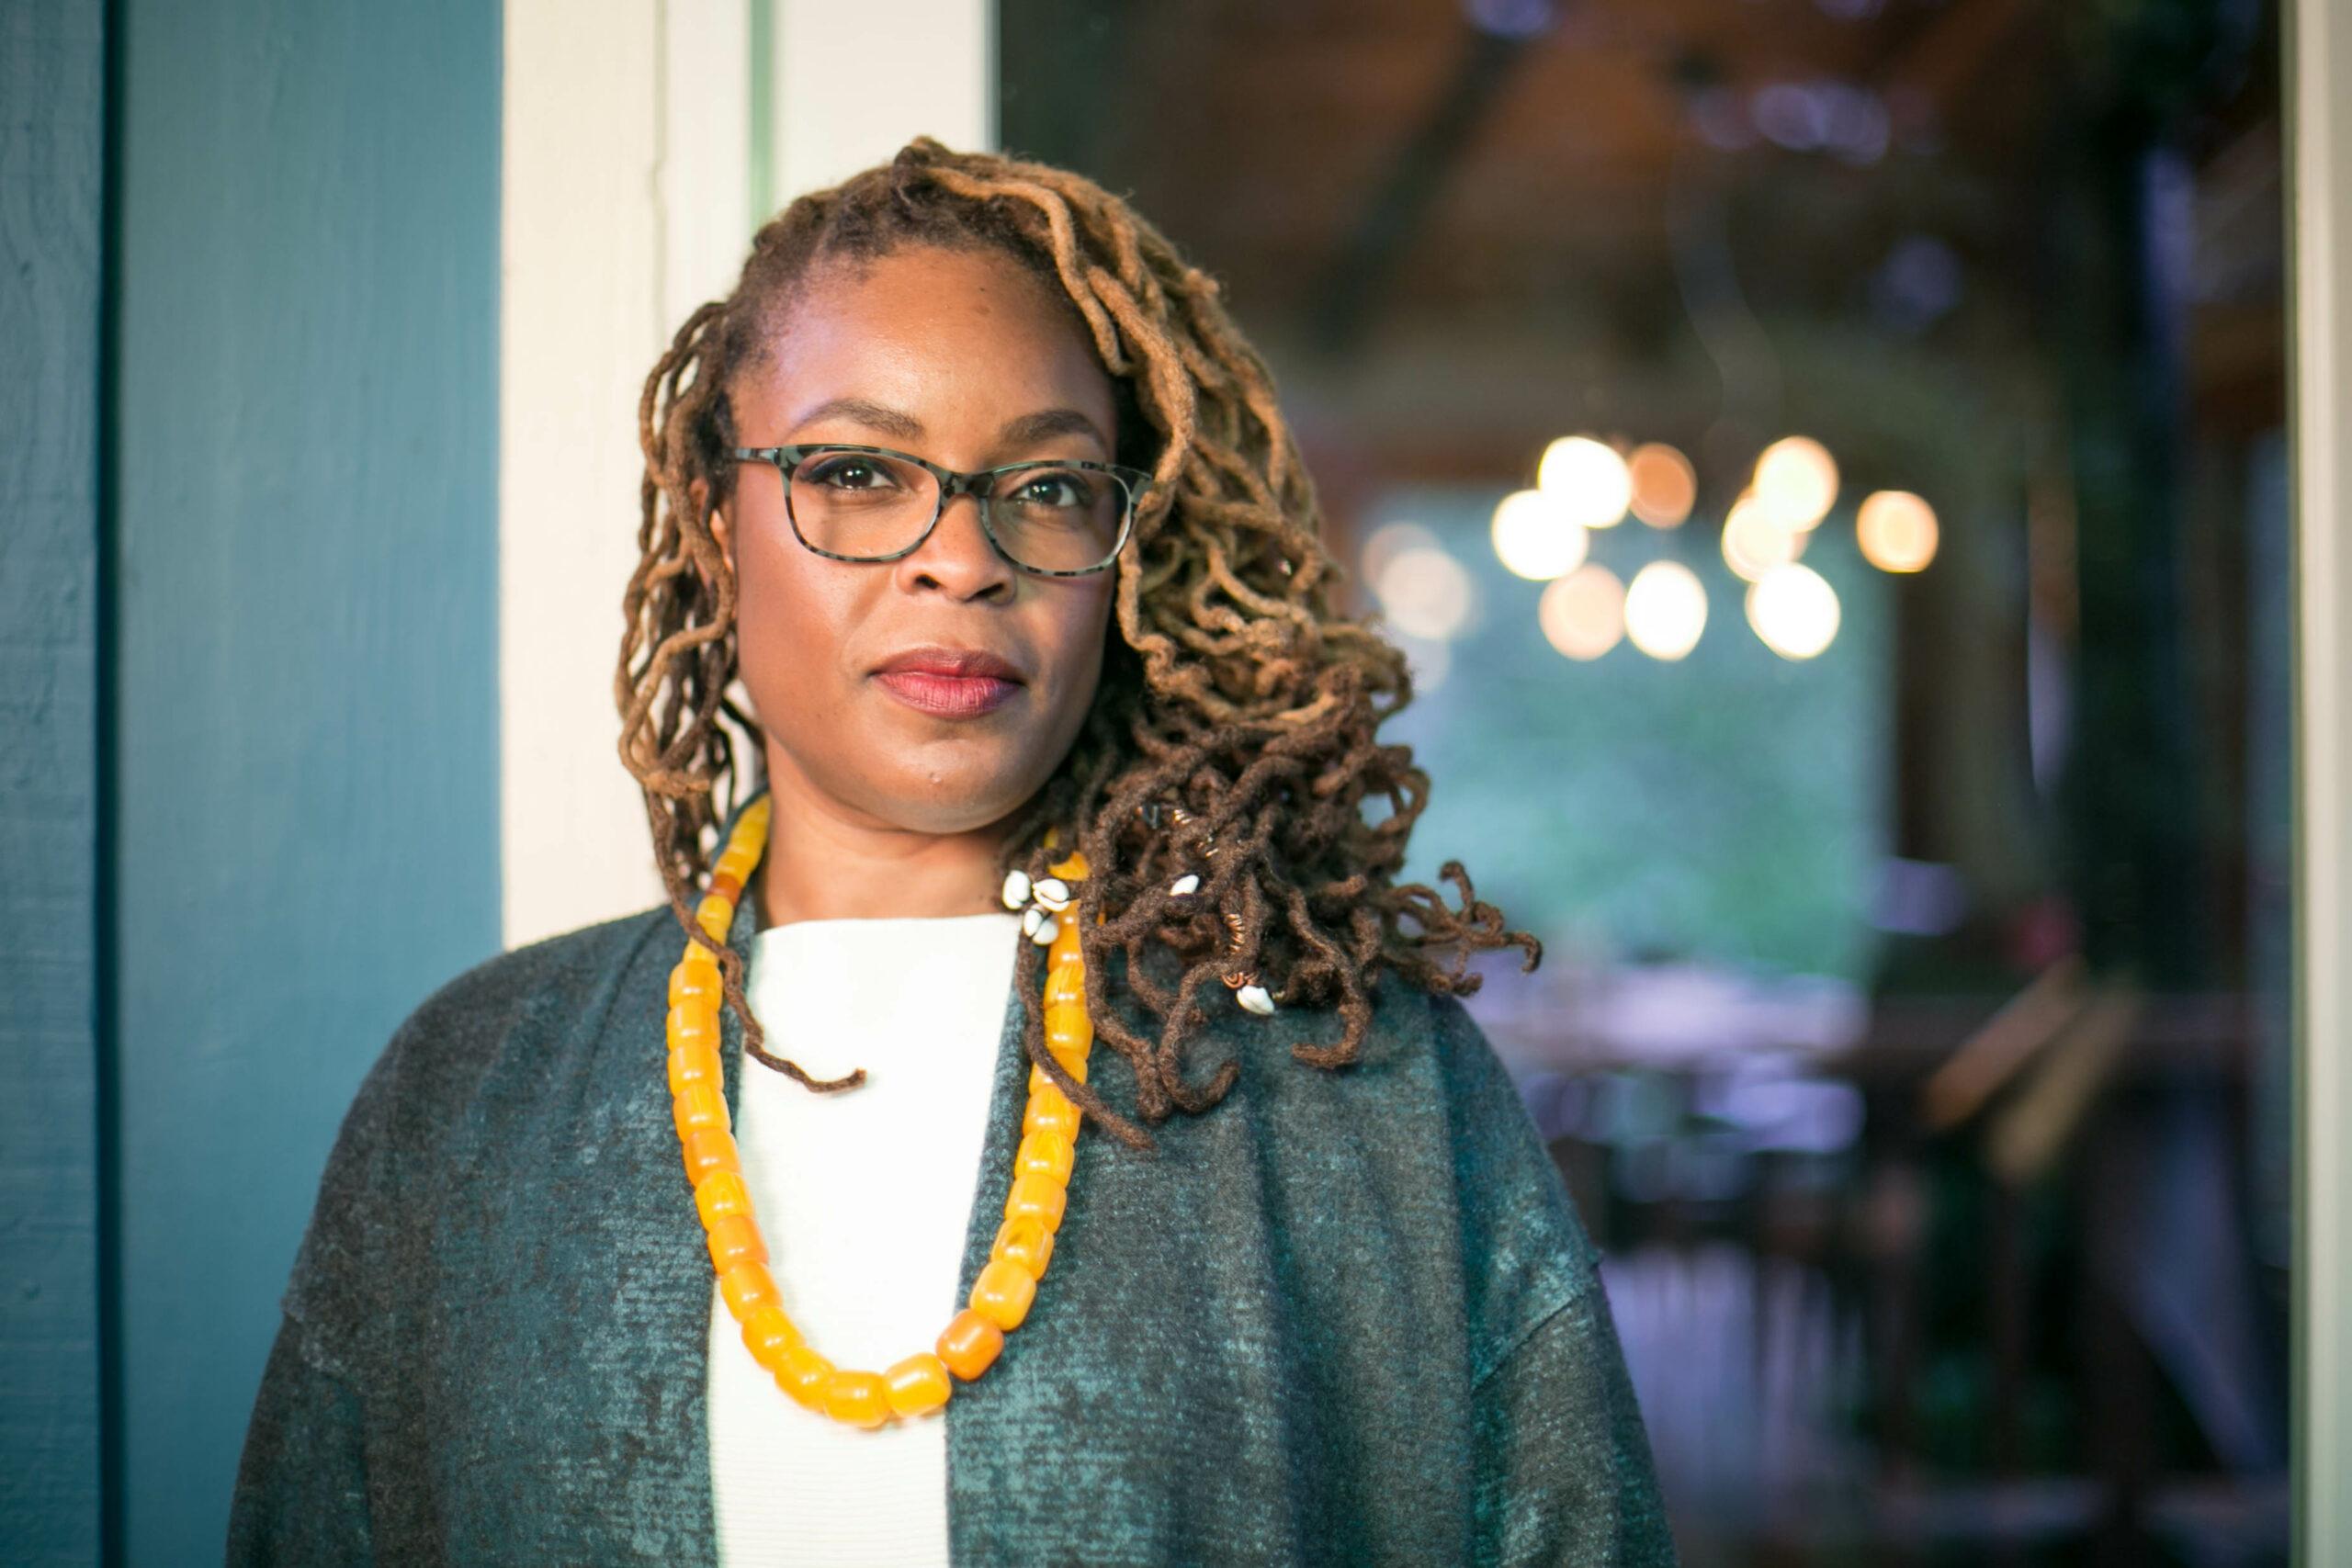 Meet Ain Bailey: New Program Officer for the REACH Fund